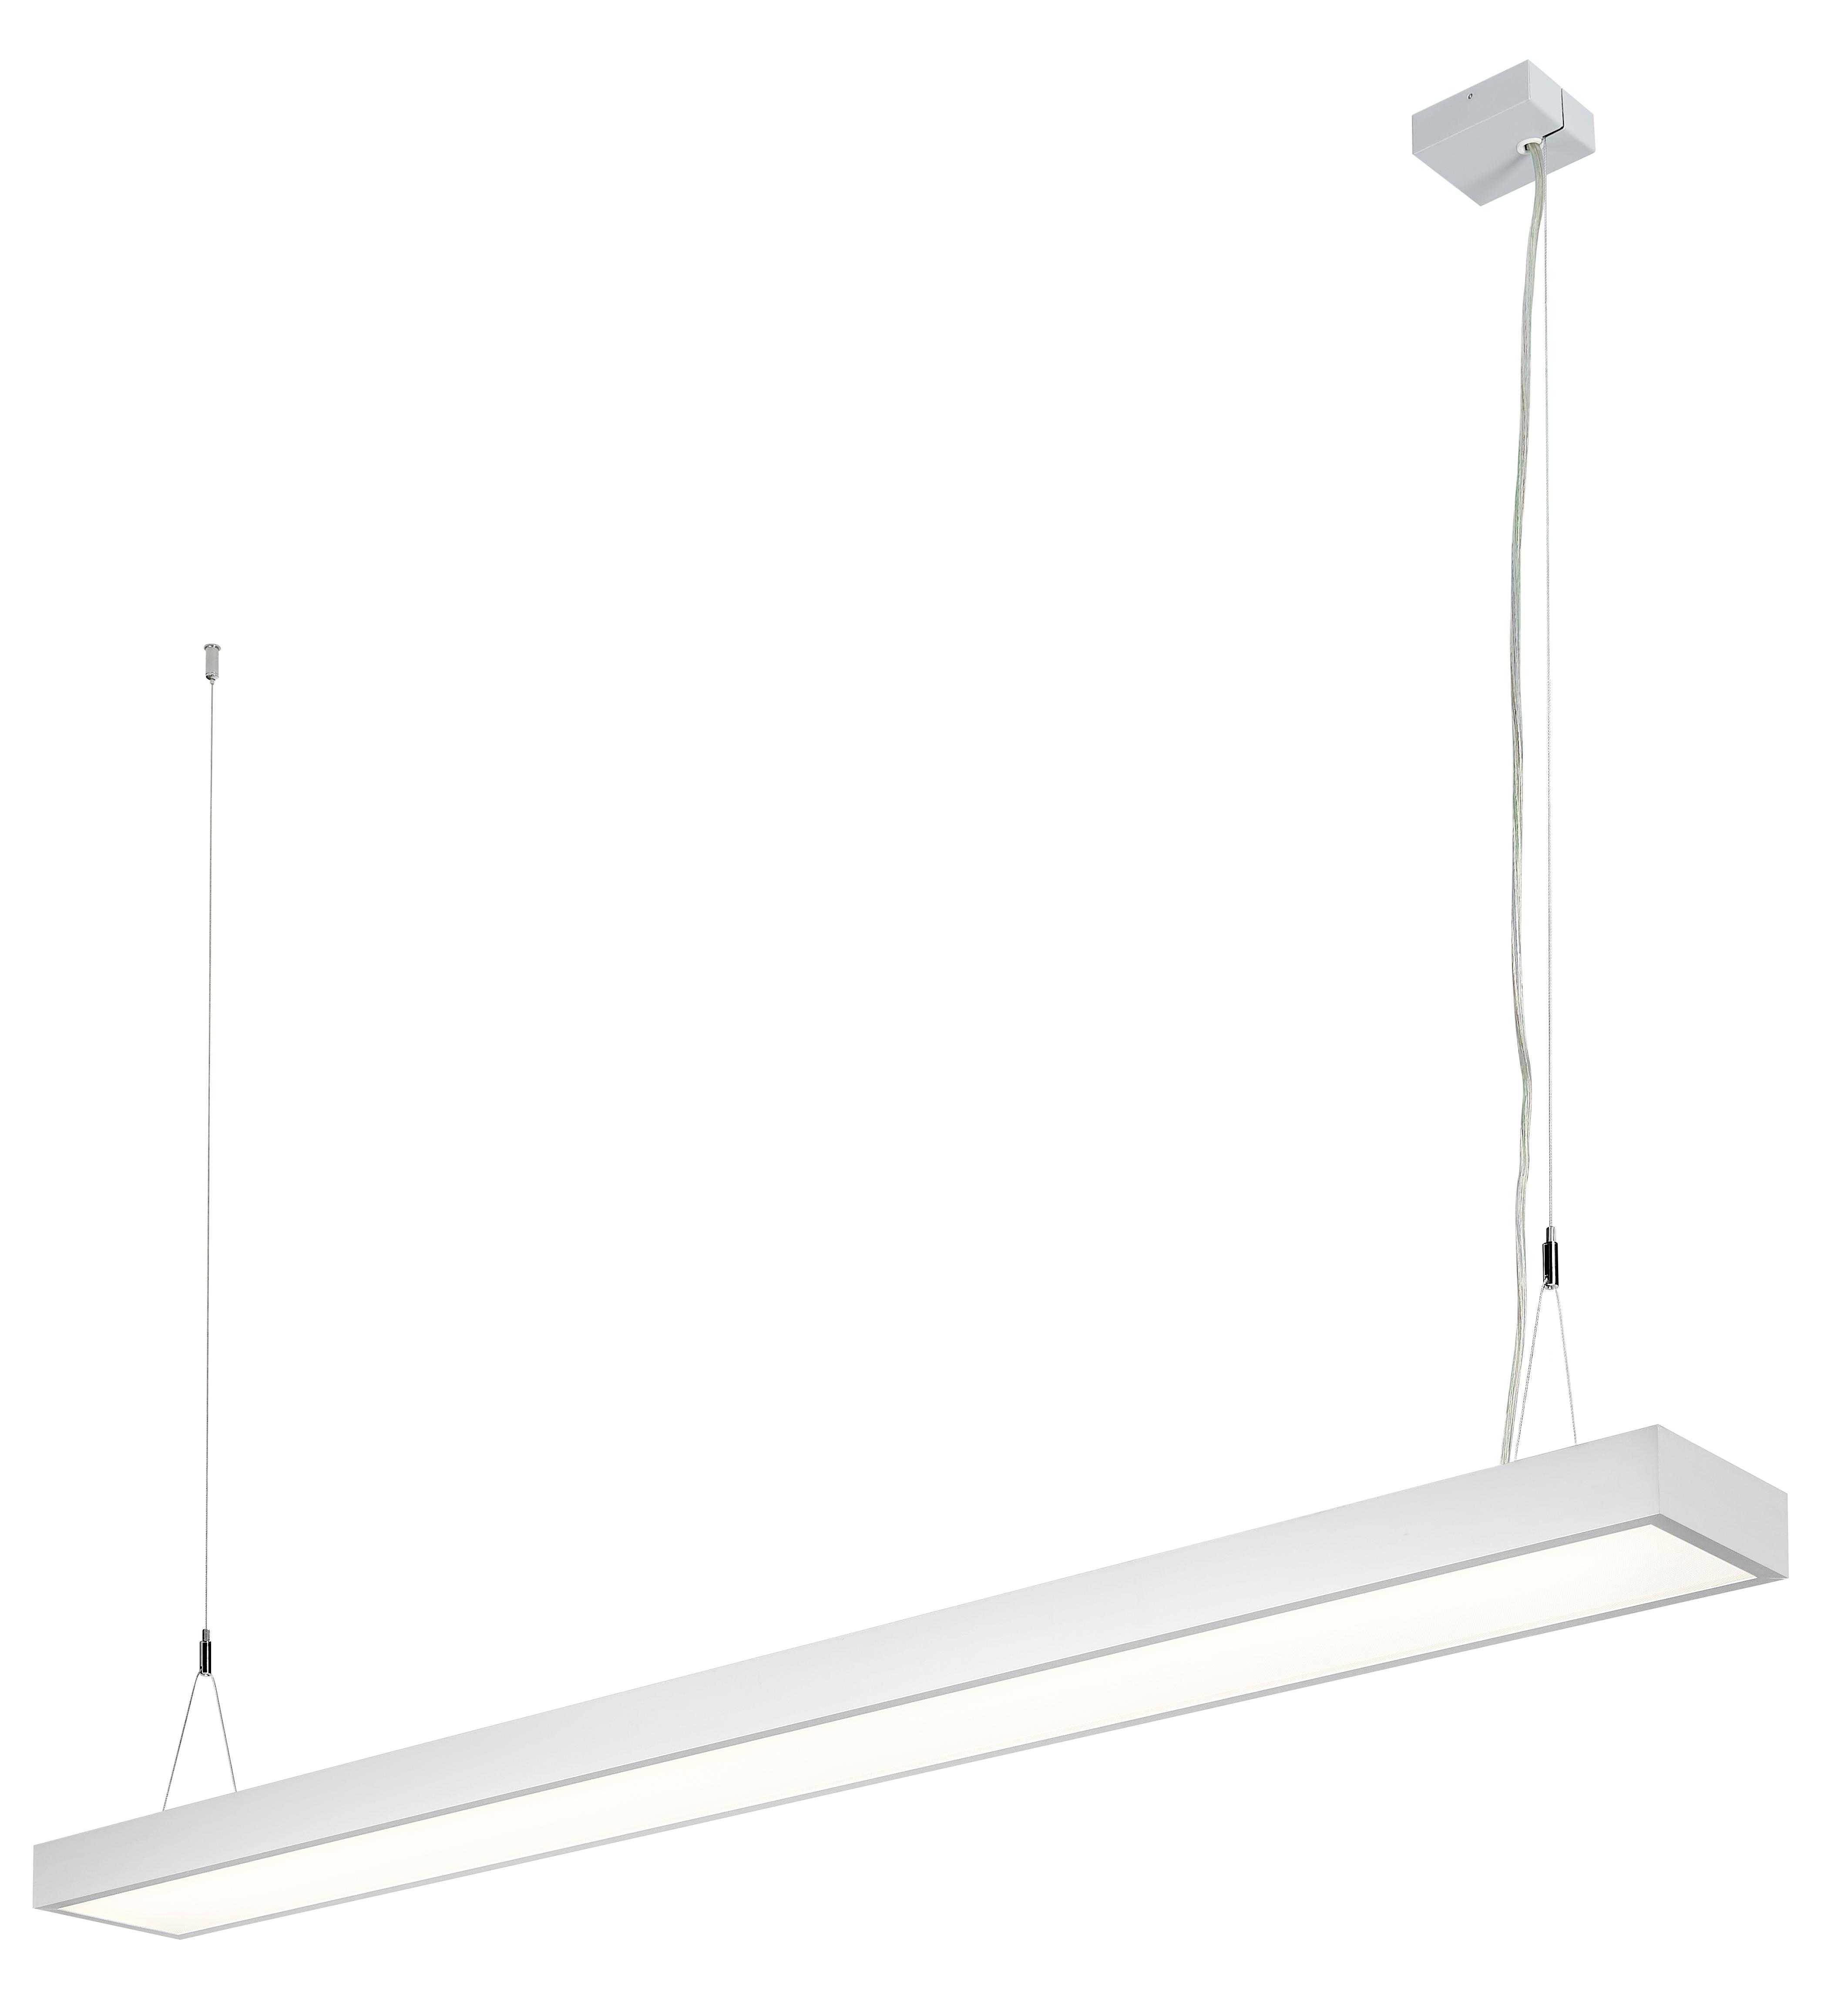 1 Stk Office LED D/I 86W, 4000K 9735lm, DALI, eloxiert L-1,5m LI38OF0061